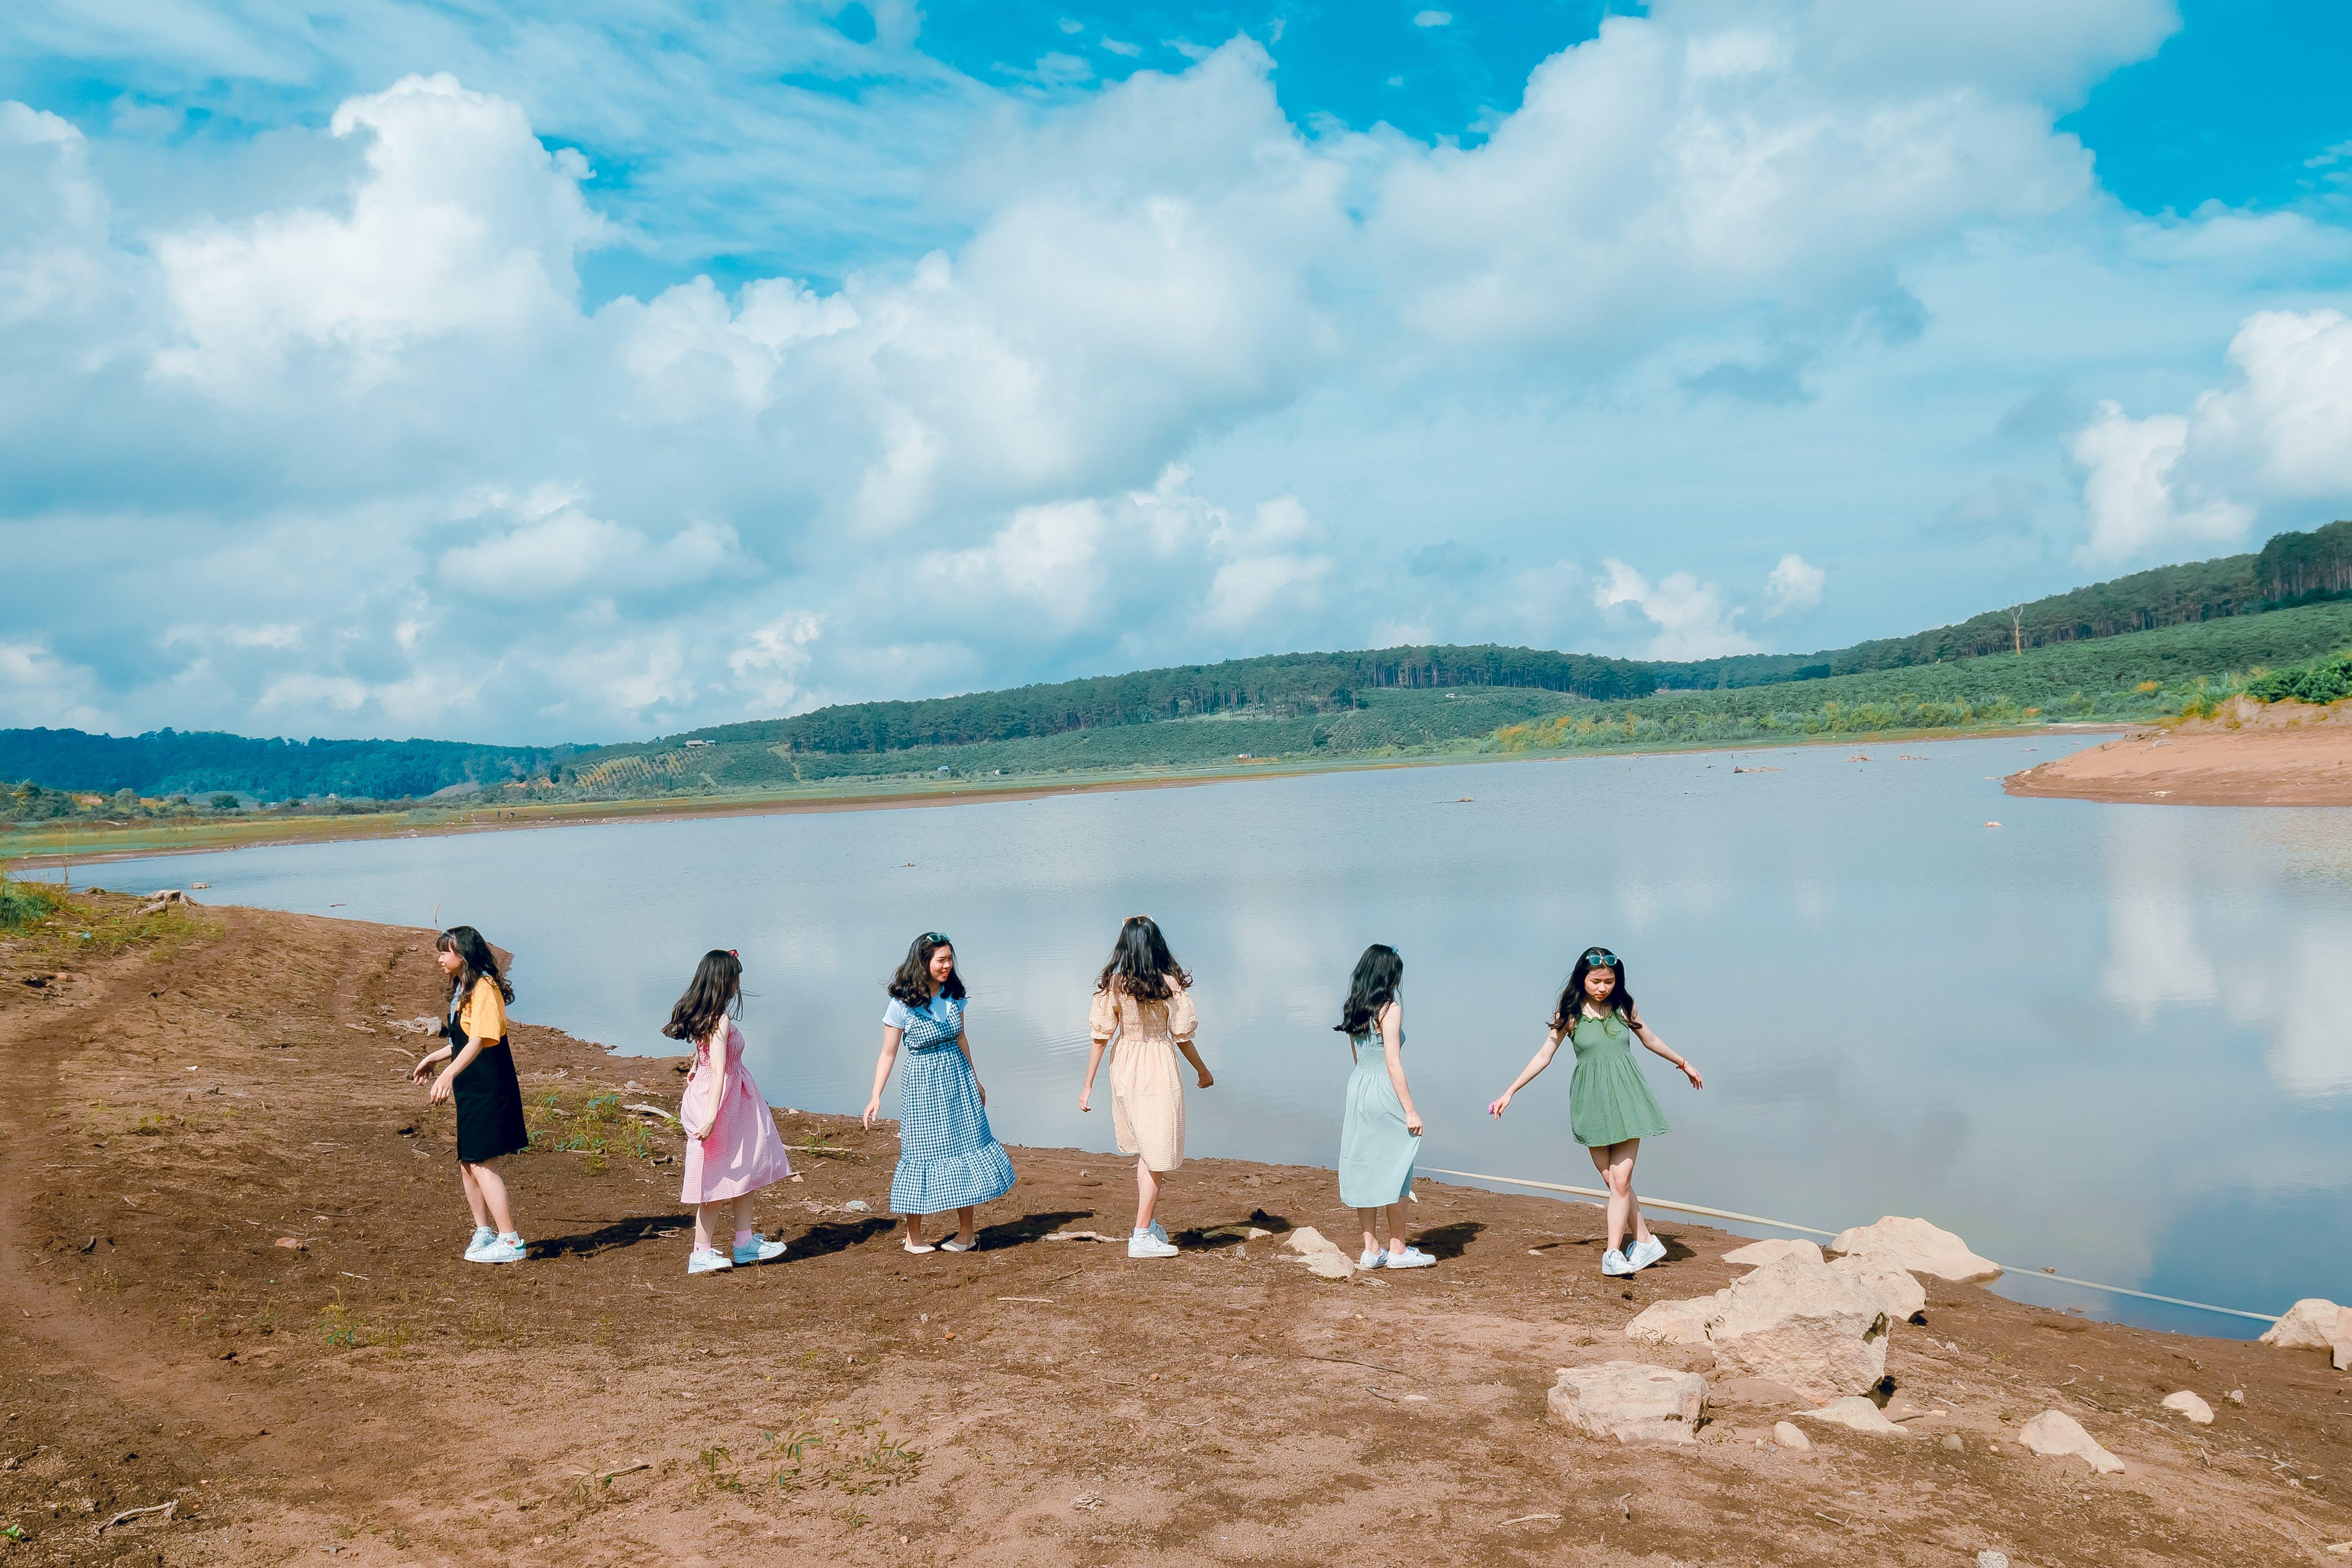 Six Girl Standing Beside Body of Water